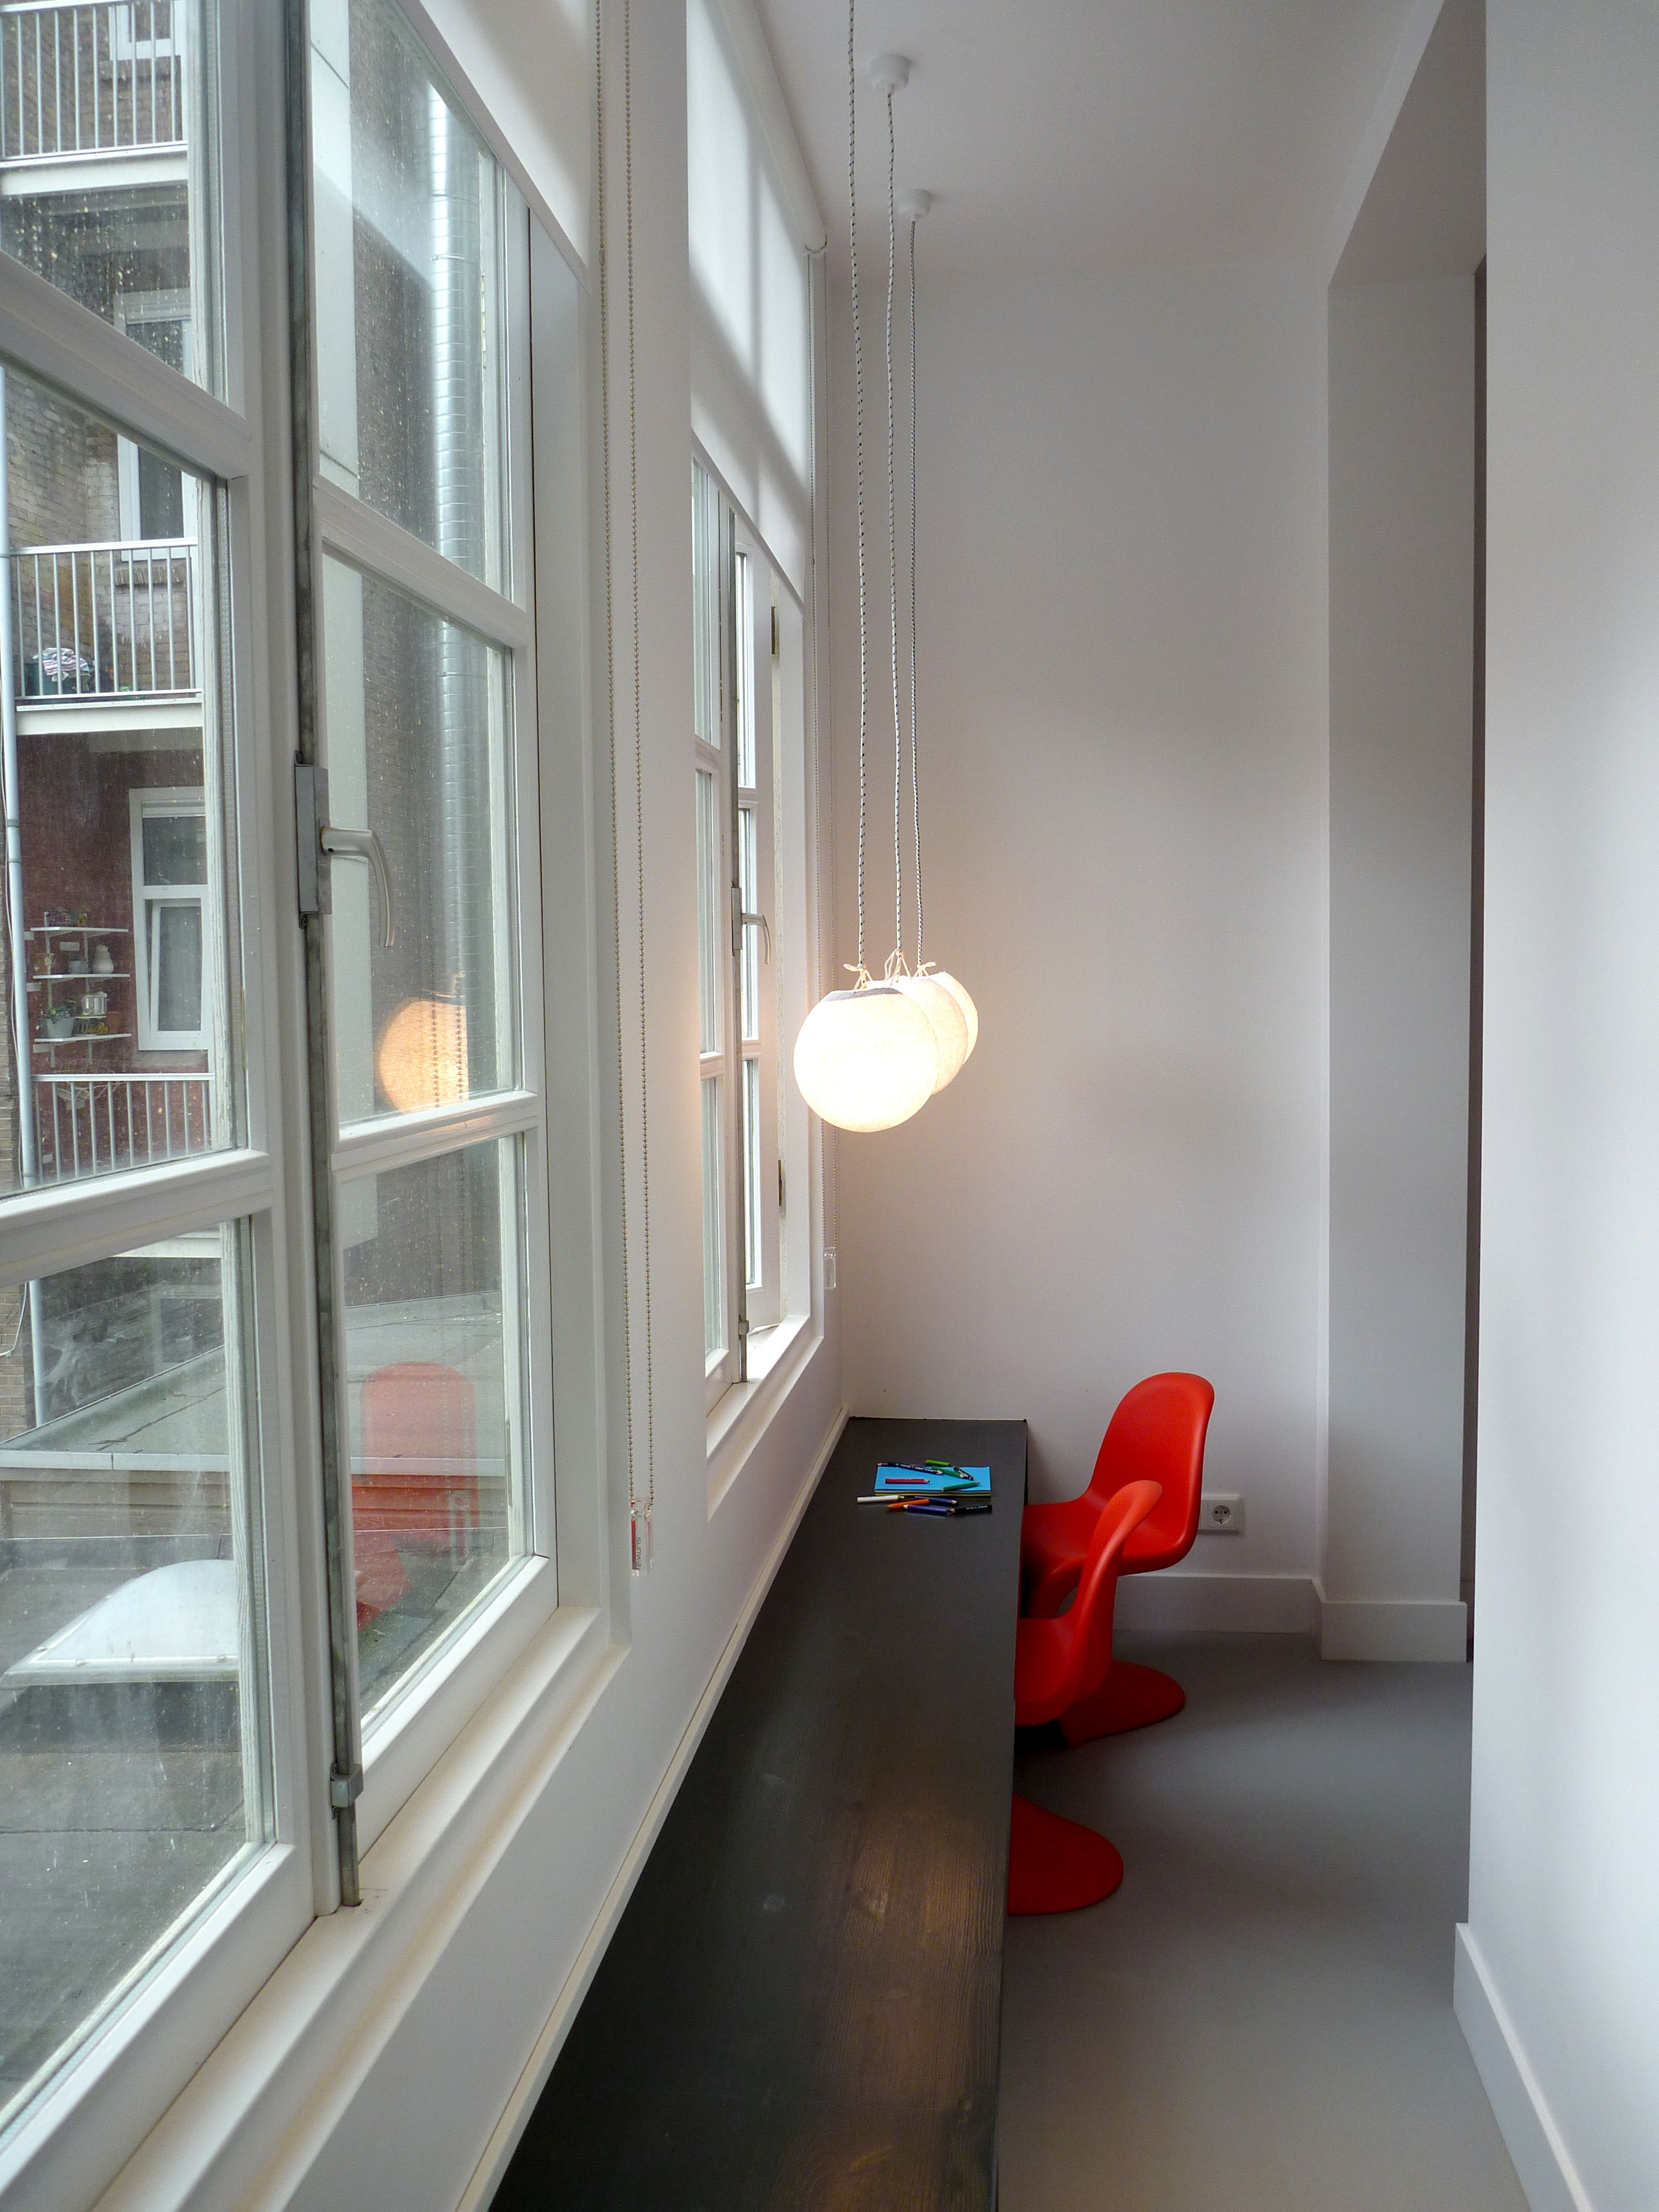 Studio ei ontwerp ruime loft amsterdam for Interieurontwerp amsterdam